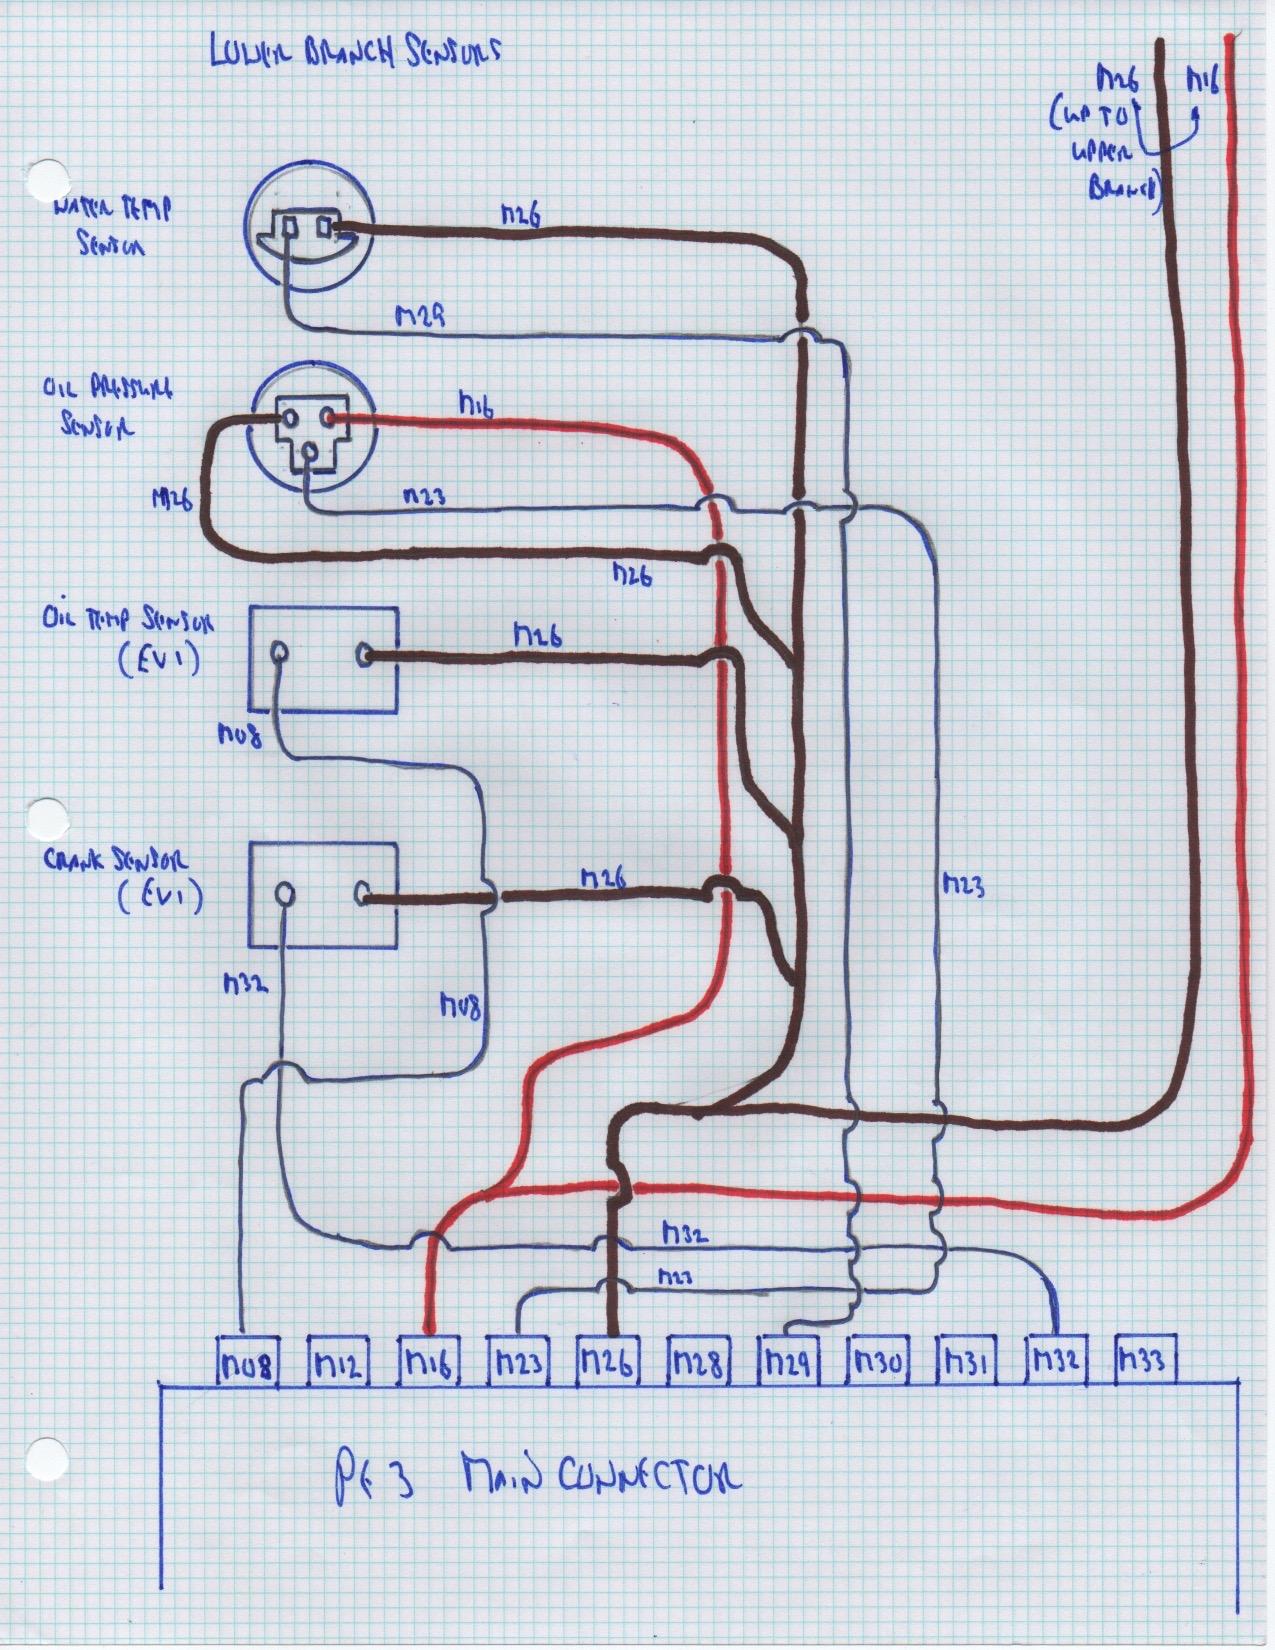 zetec 85?w=660 lower sensor branch wiring diagram junk yard zetec oil pressure sensor wiring diagram at mifinder.co